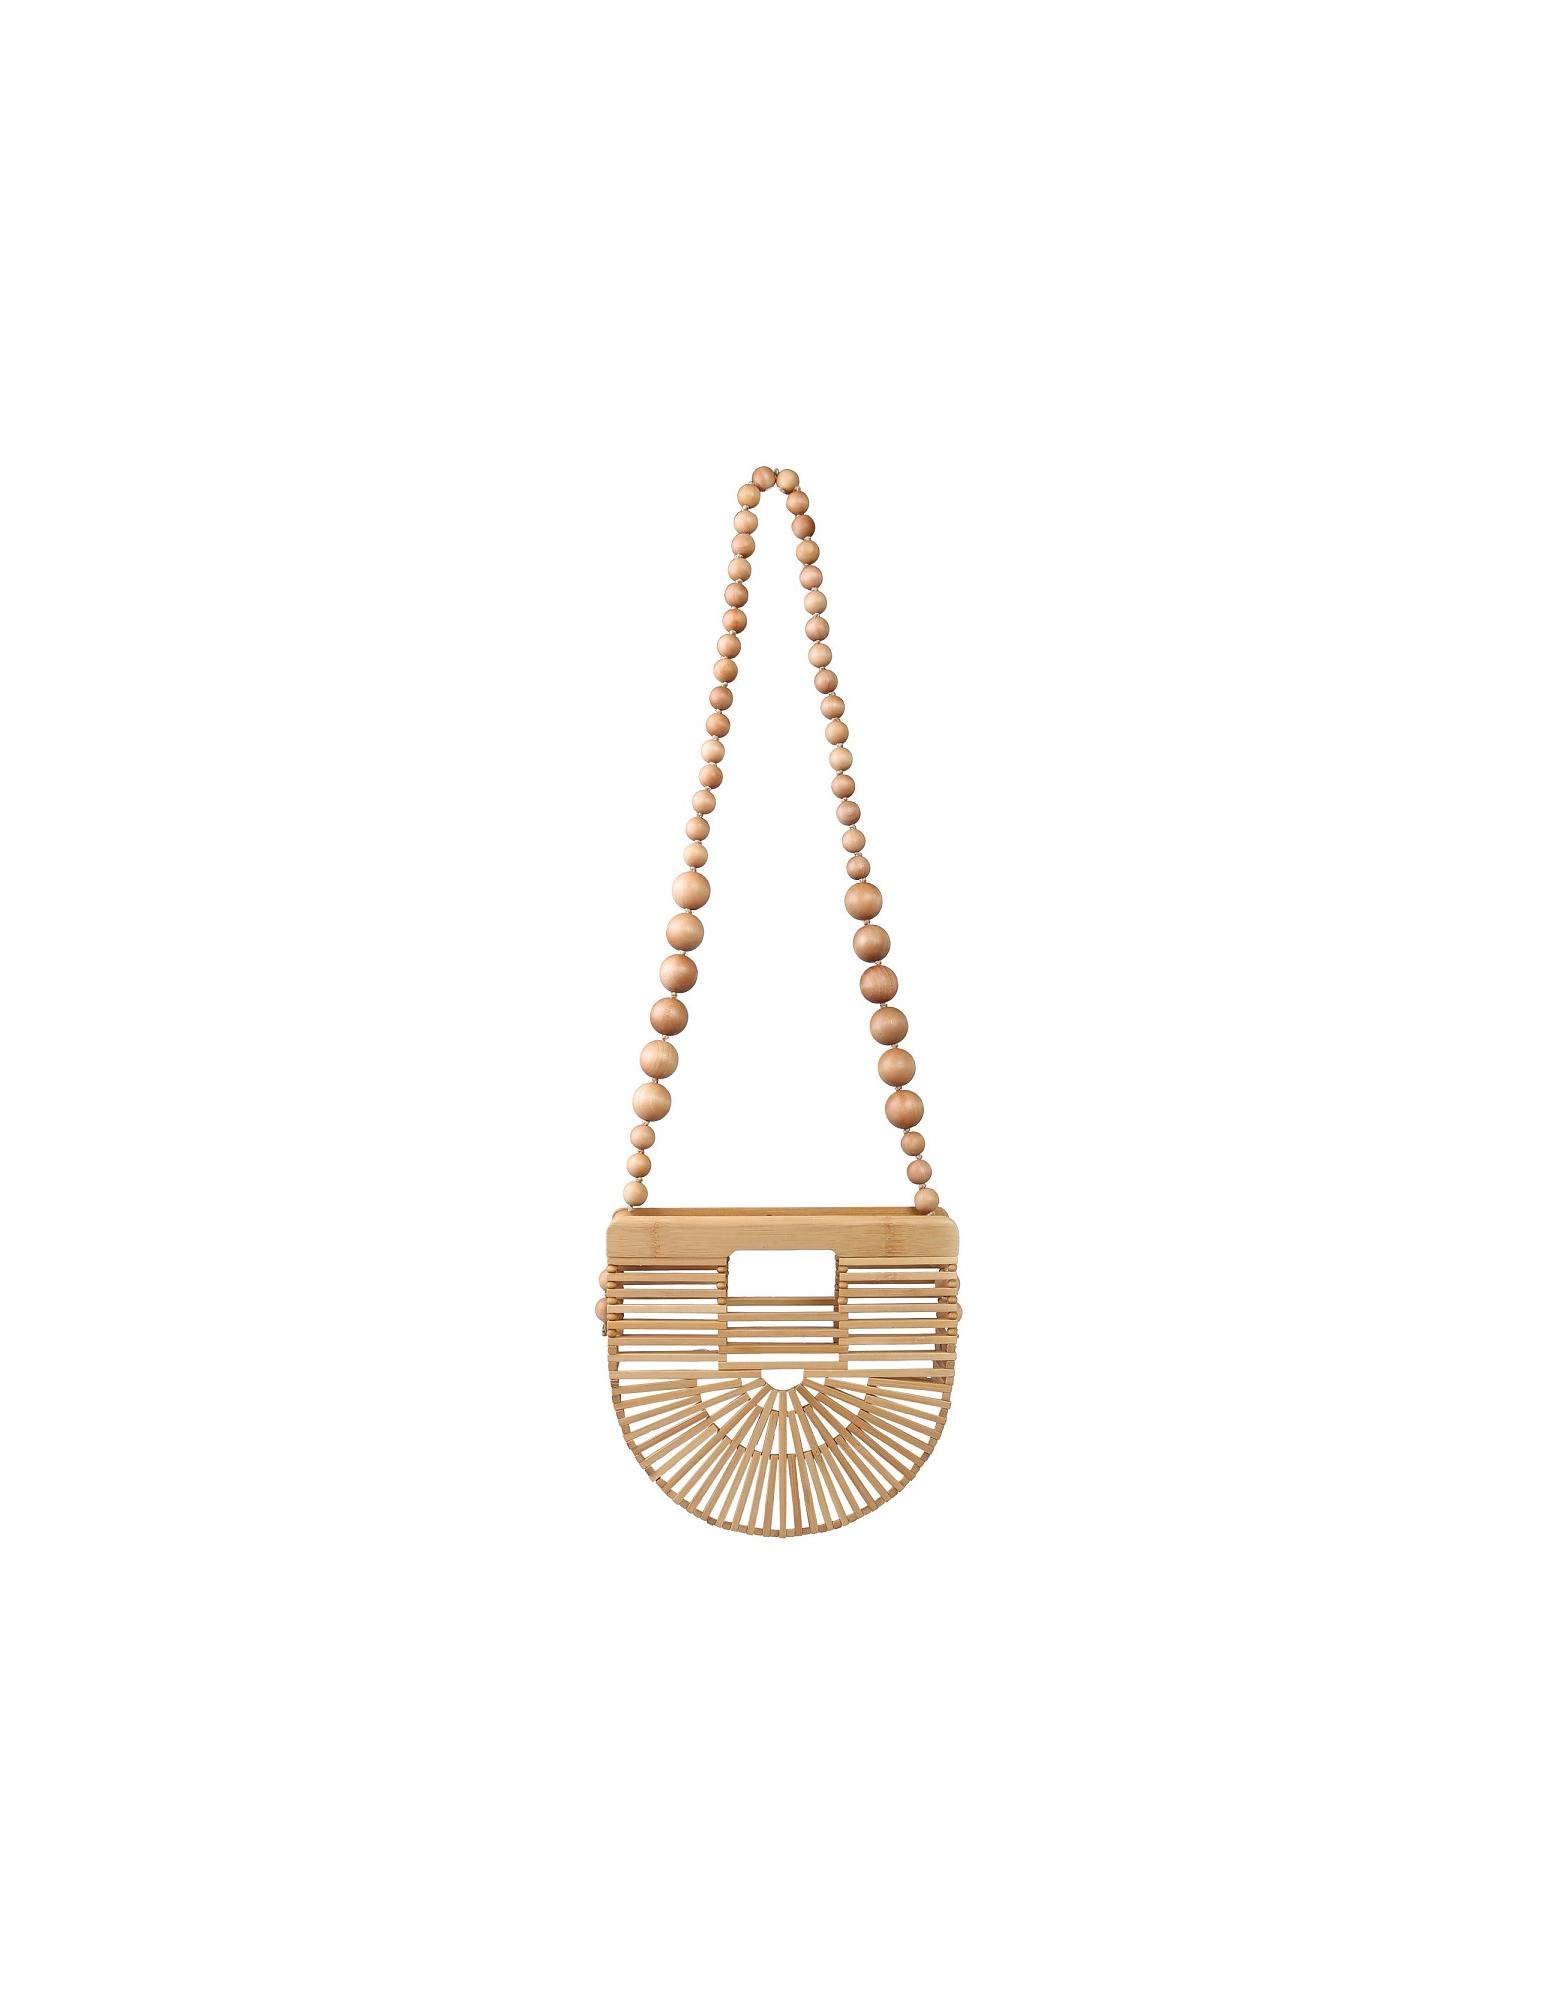 Cult Gaia Designer Handbags, Micro Gaia's Ark Bag